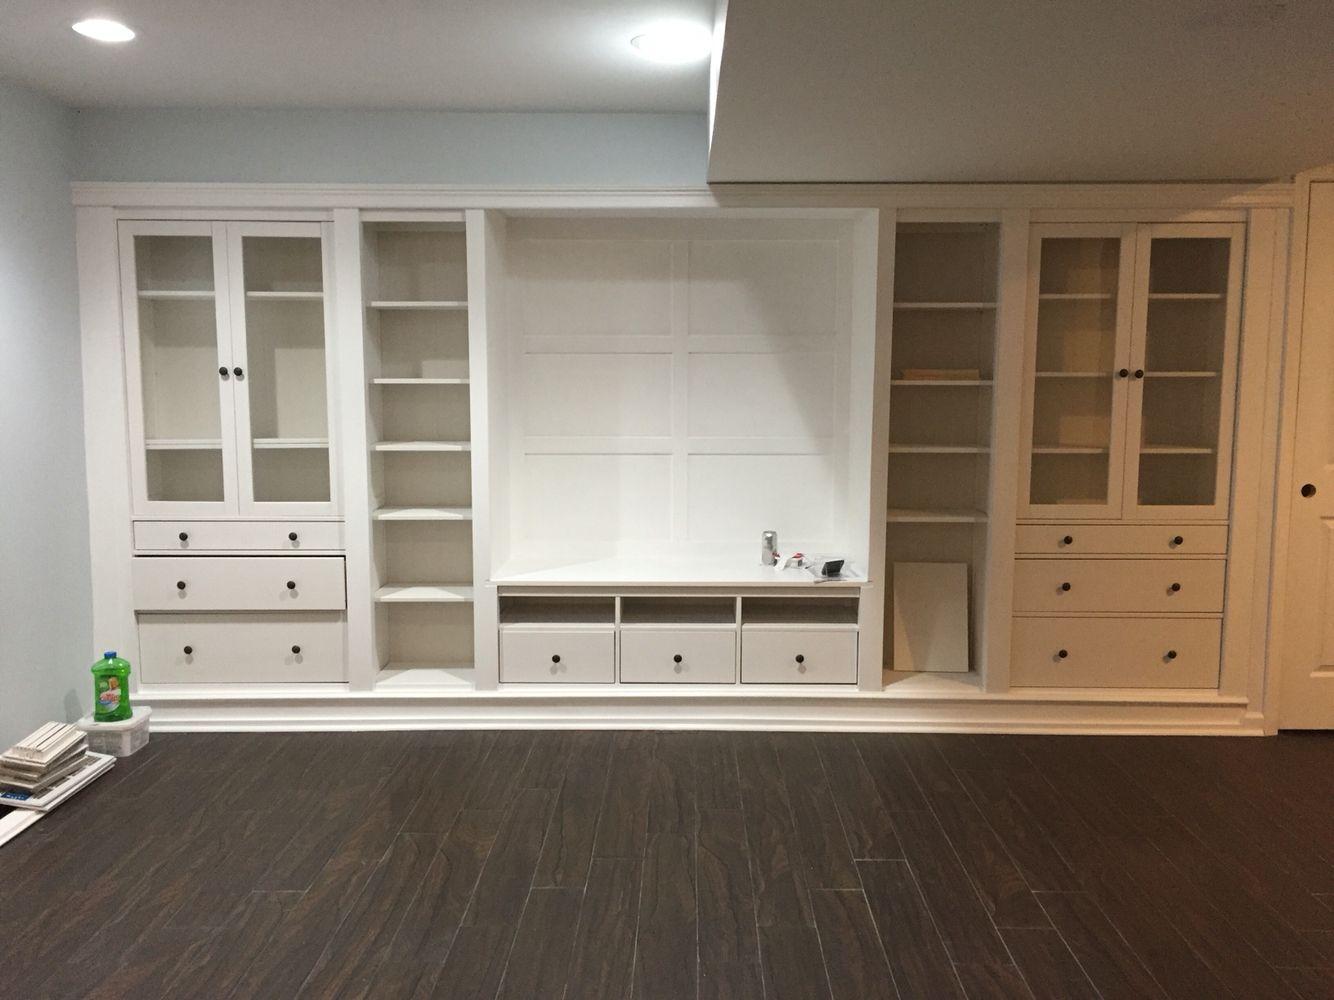 Artesanato Com Cd E Croche ~ IKEA Hack Built Ins In Our Basement Hemnes Series Sala de estar Pinterest Estante sala